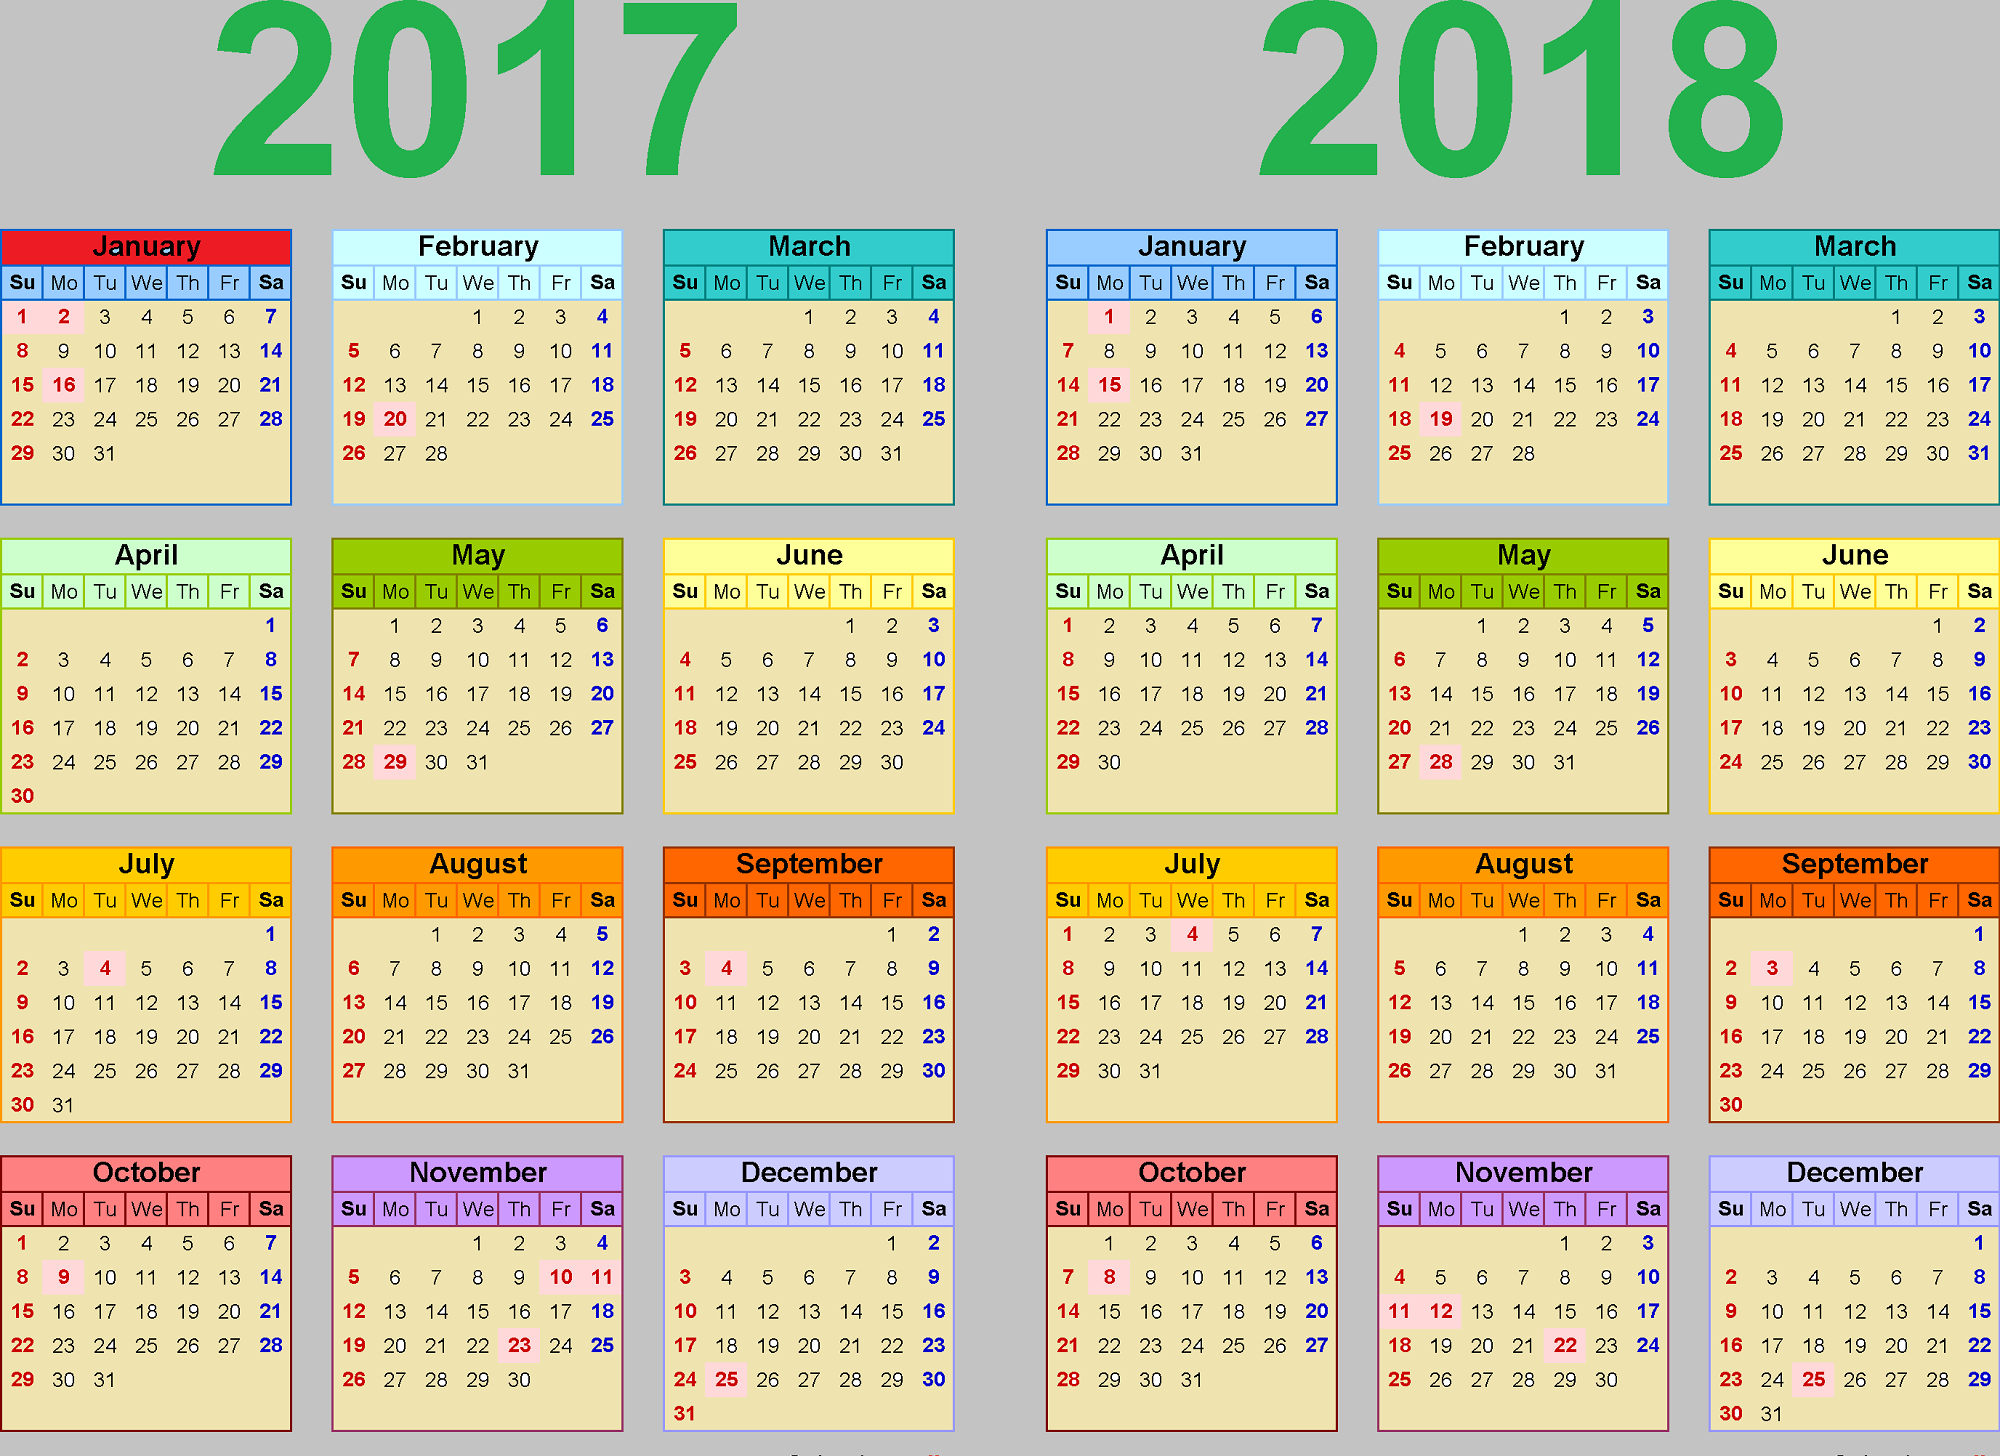 October 2018 Blank Calendar Printable PDF, Word, Image ...